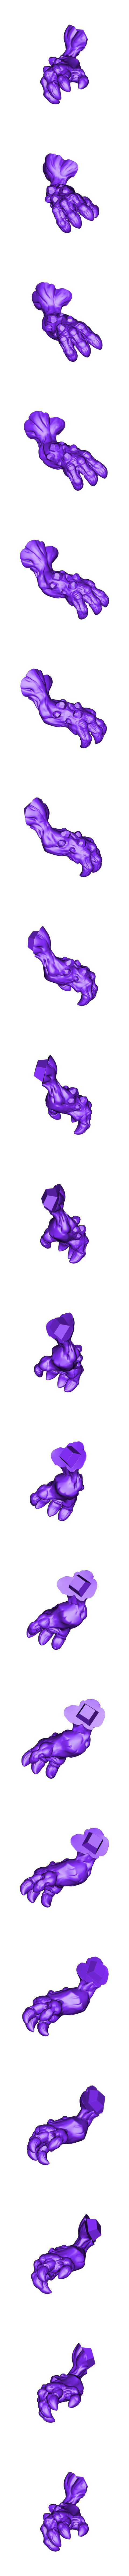 Mushroom_arm_right.stl Download free STL file Mushroom man • 3D printer design, duncanshadow